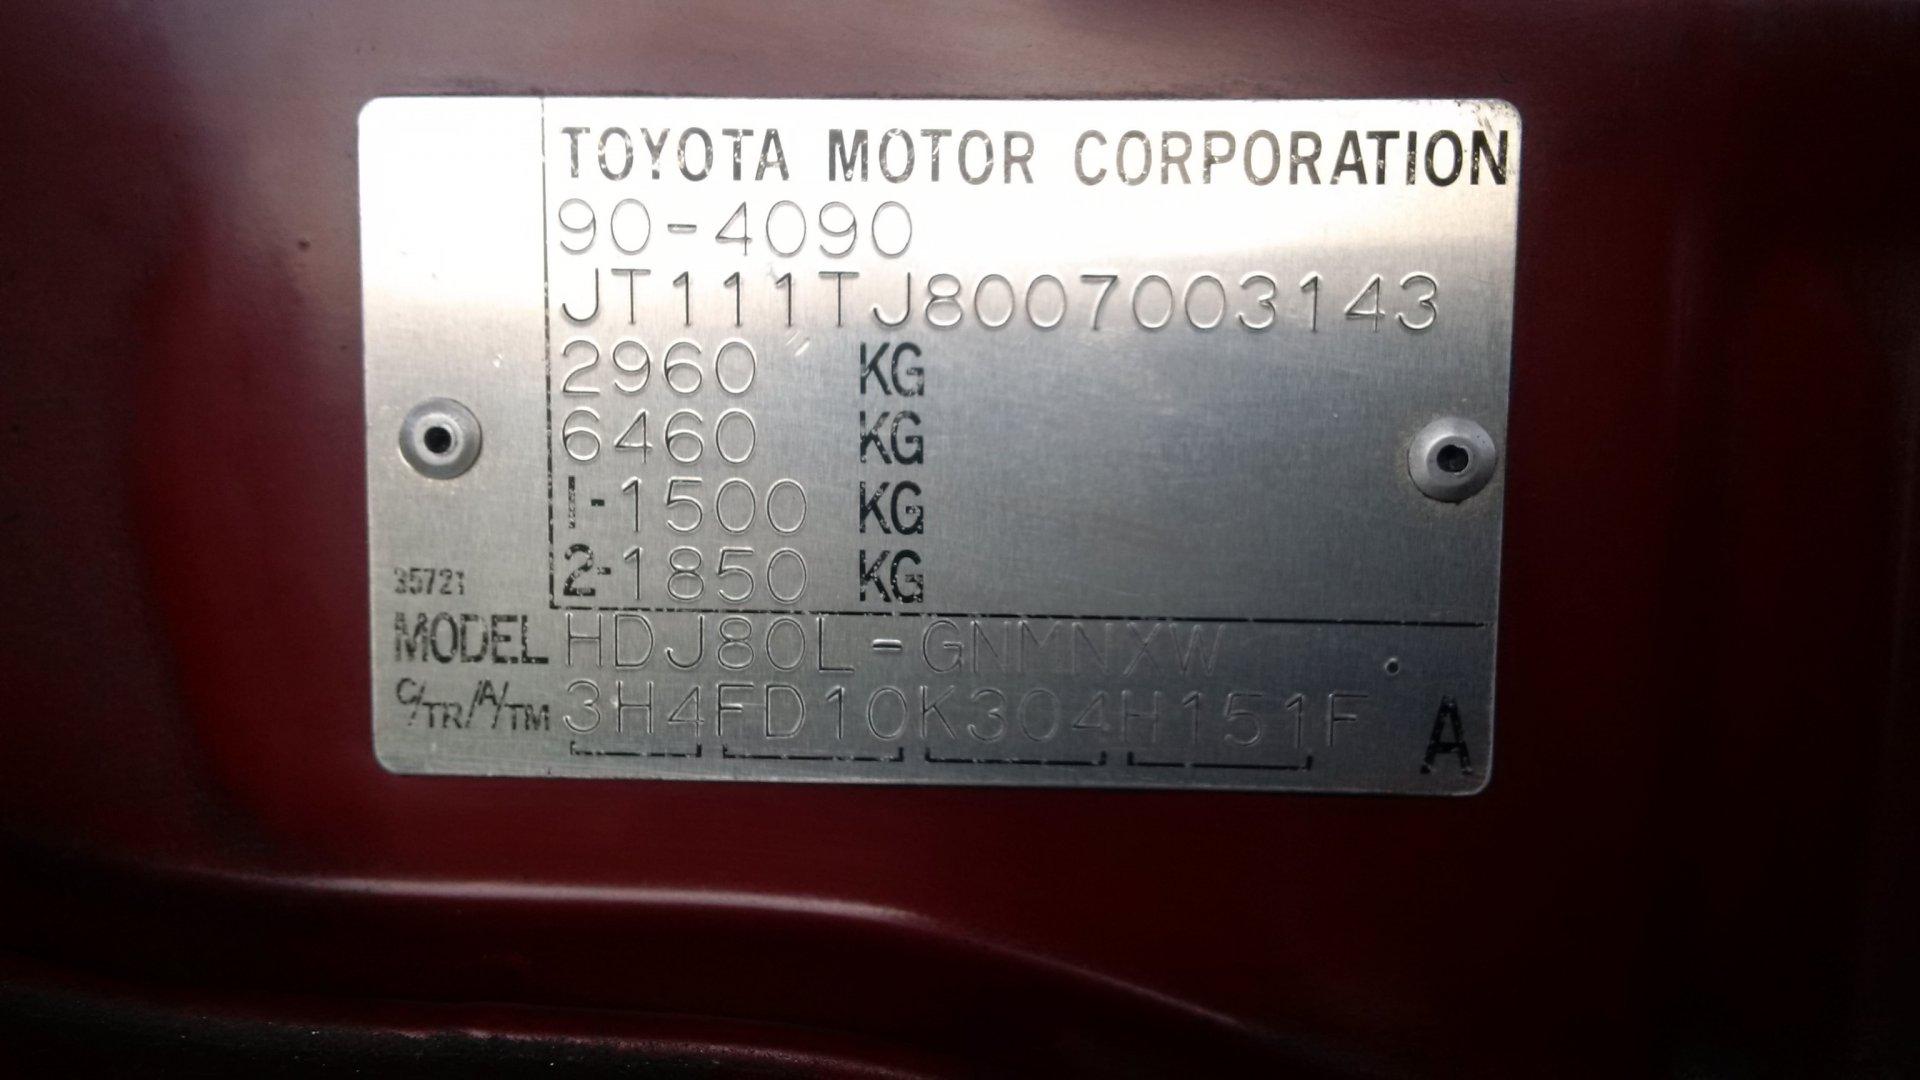 HDJ80L GNMNXW Data Plate 2.jpg